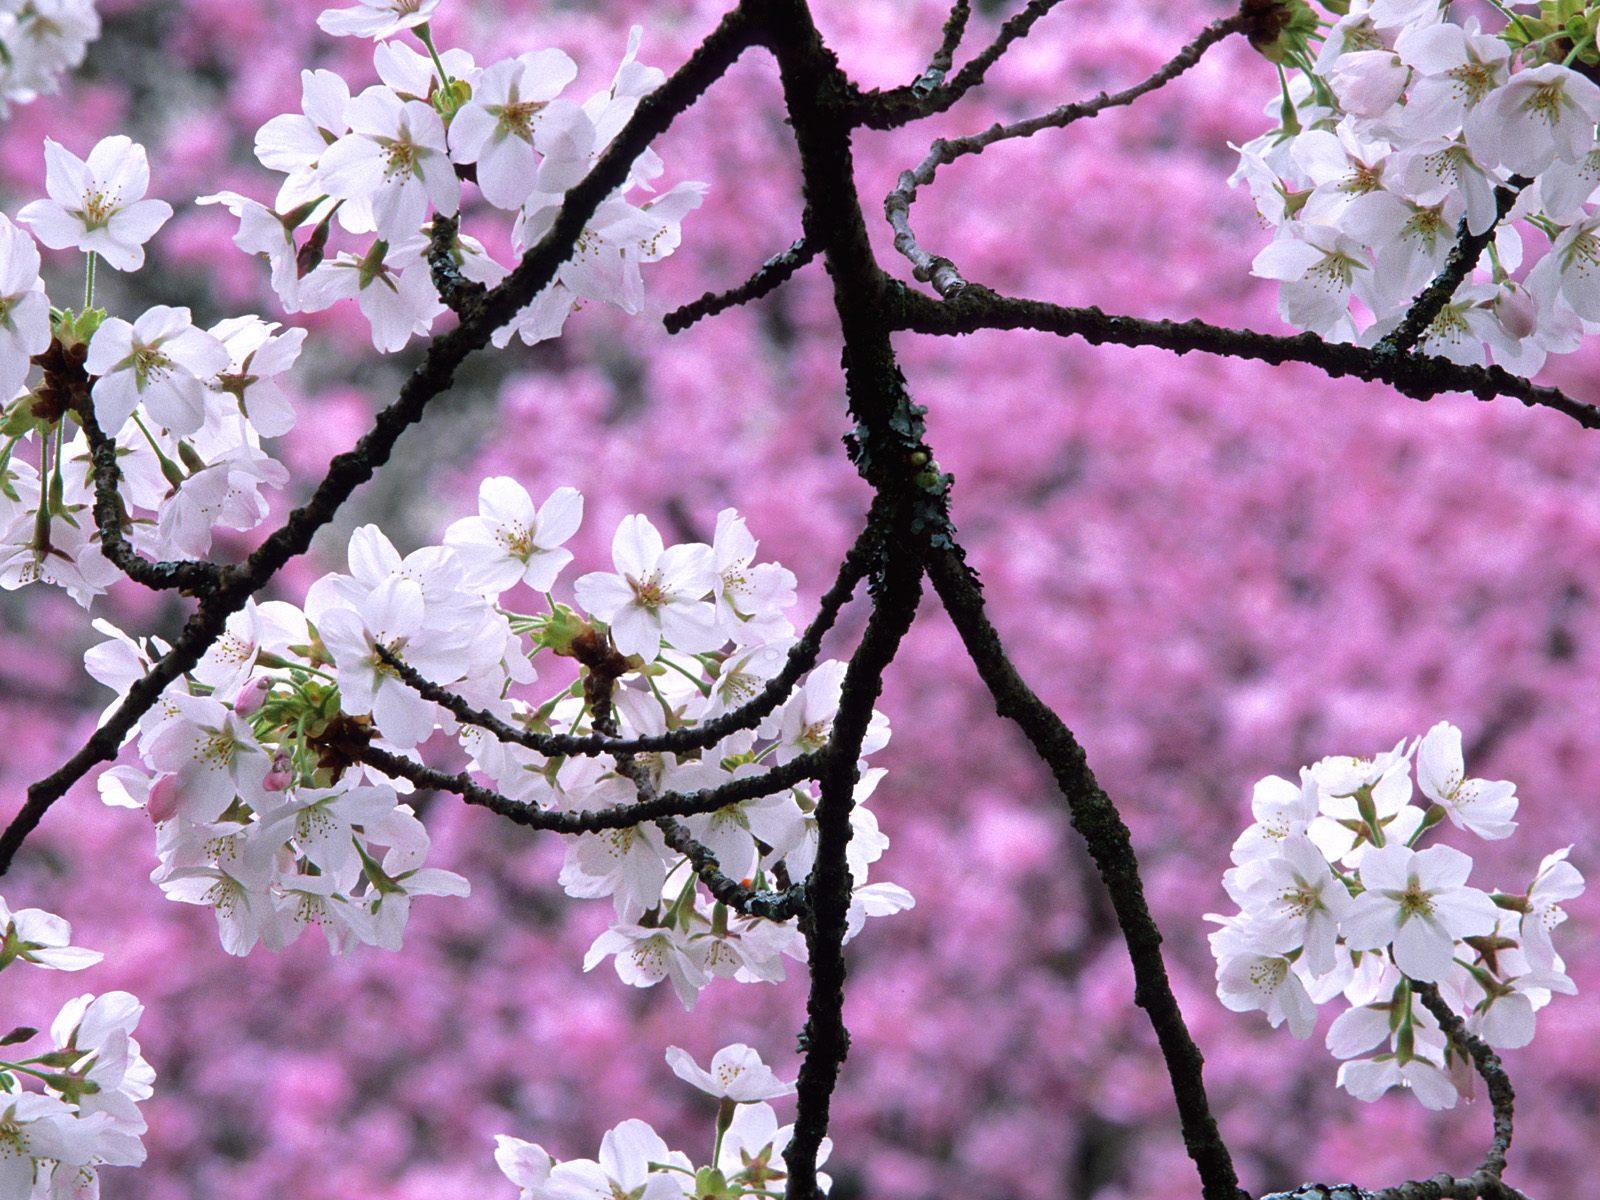 http://4.bp.blogspot.com/-vRUWYqrBpd0/TktPVLRTu8I/AAAAAAAAA4w/SLMsk4TmXjo/s1600/Cherry+Blossoms+in+Spring.jpg